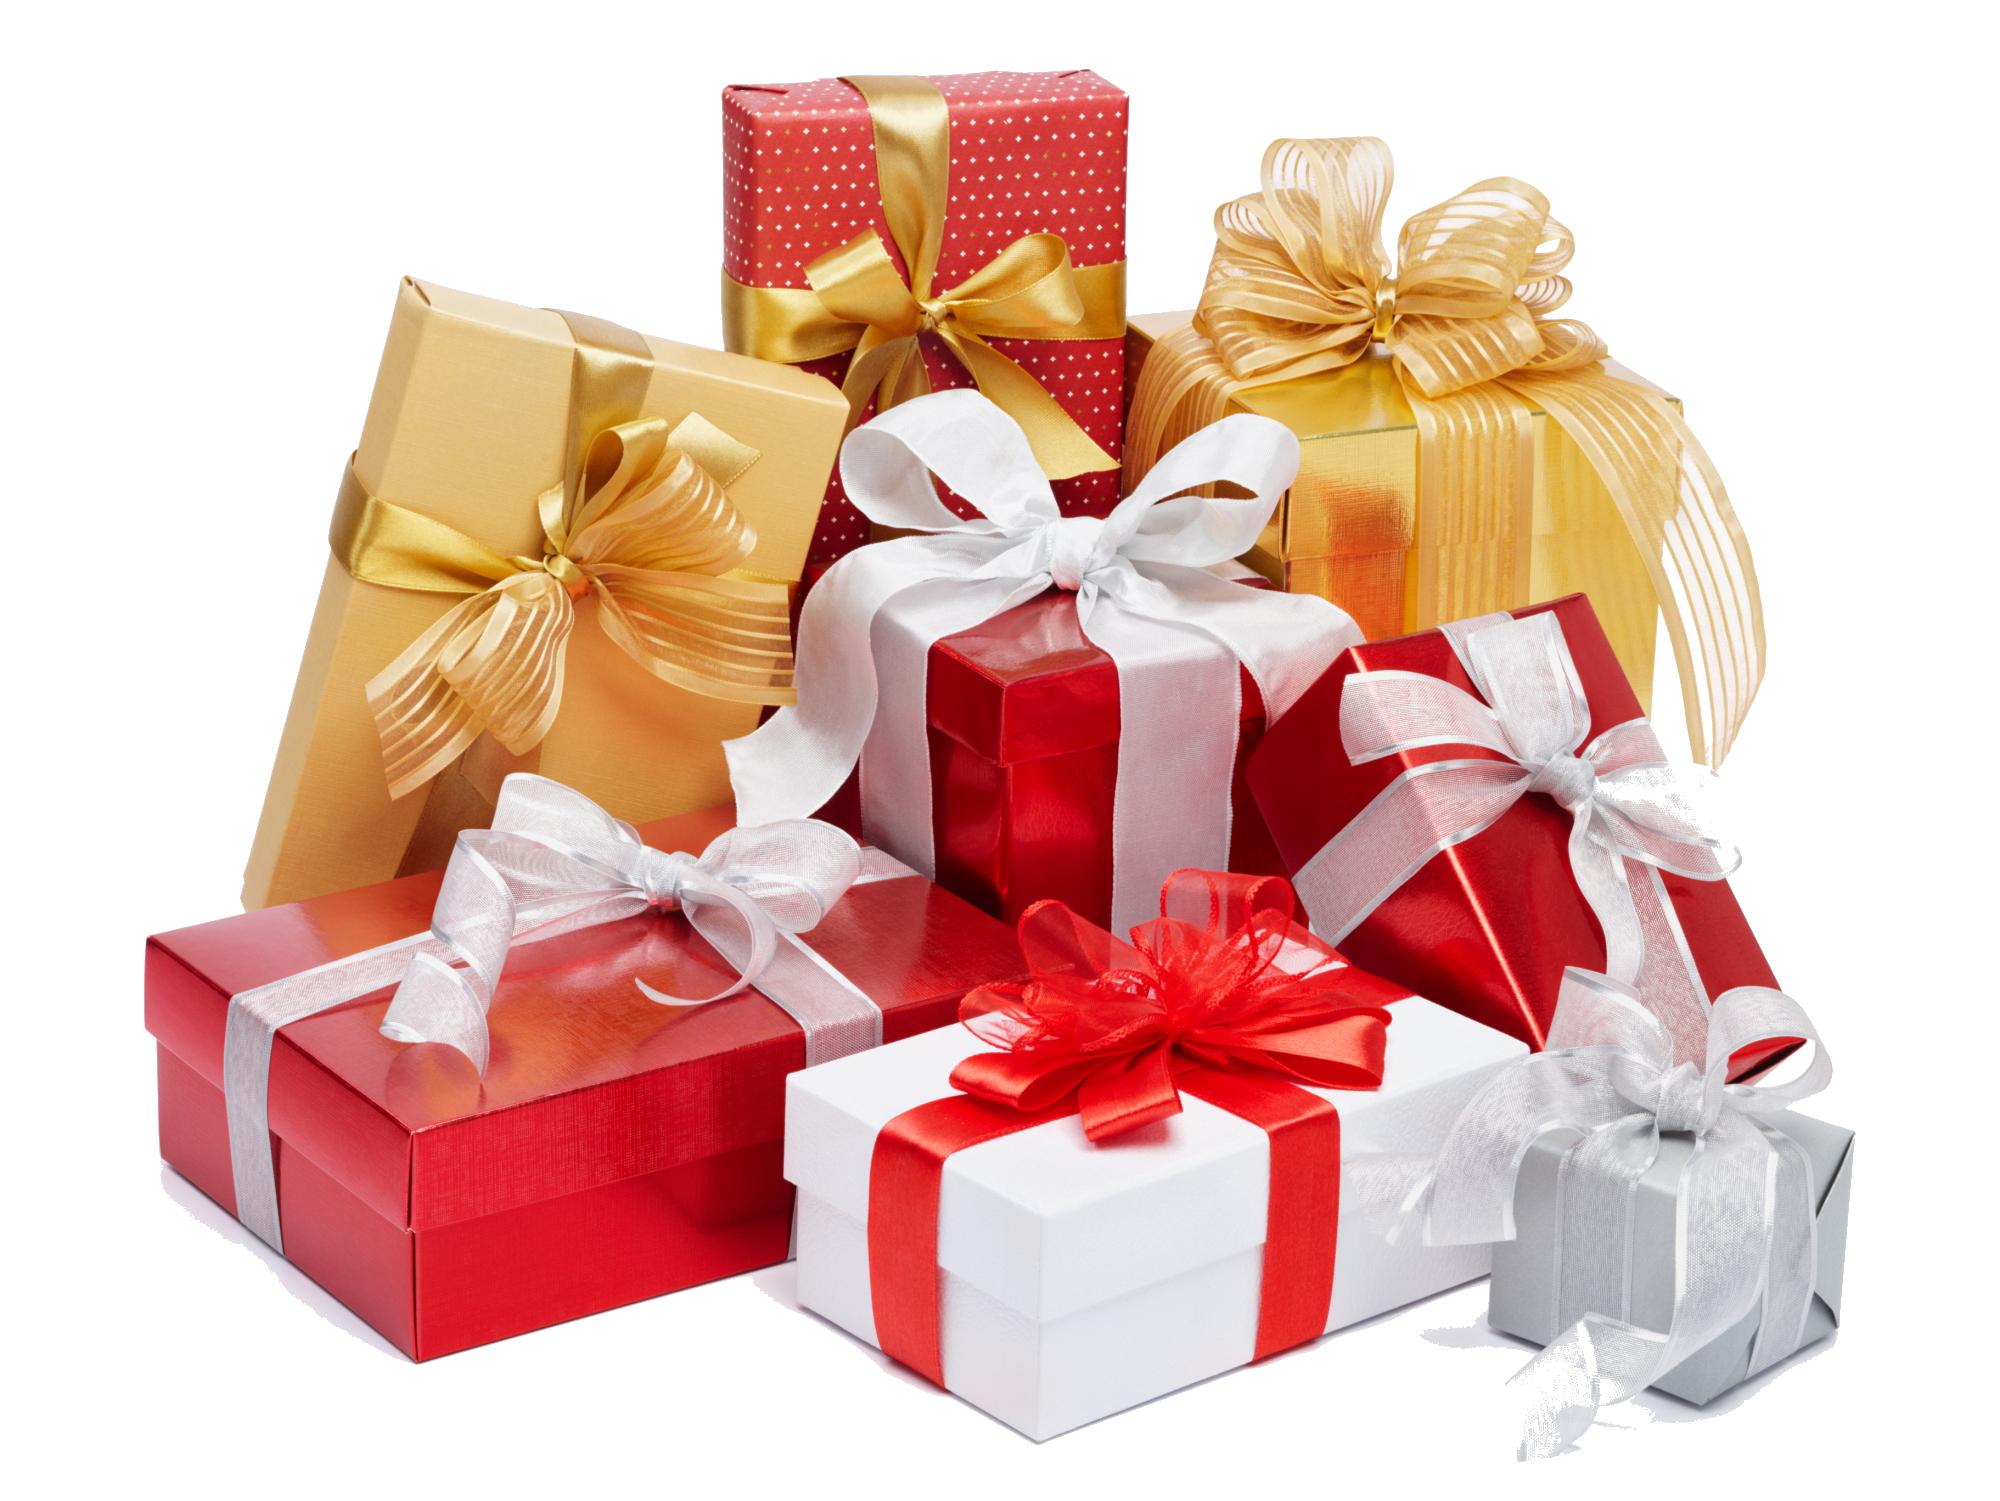 Toys For Tots Transparent : Christmas gift transparent png calendario natale e